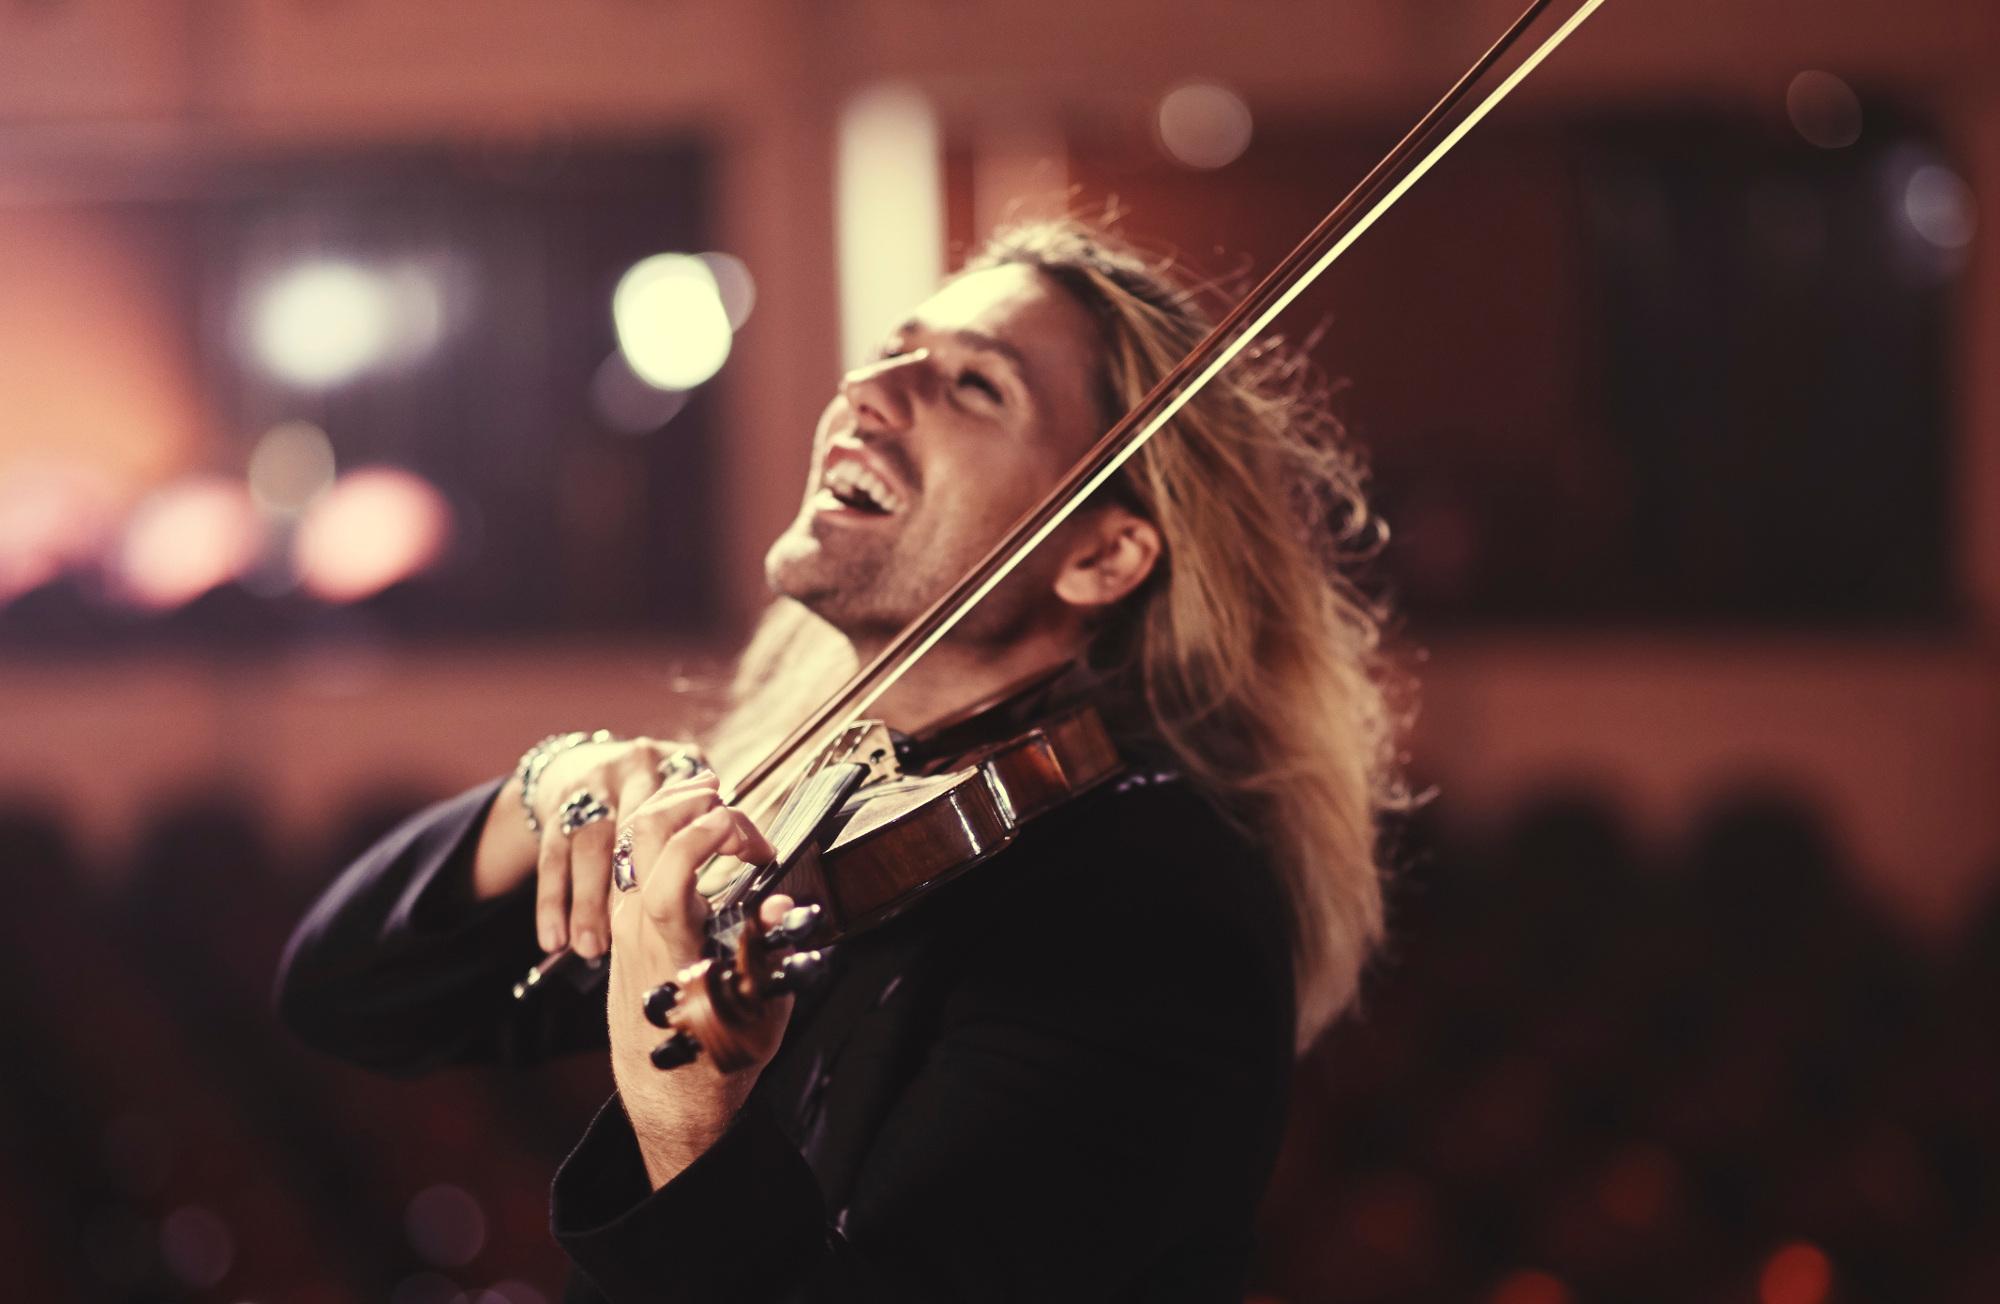 David Garrett en récital à Strasbourg le 12 mai 2016